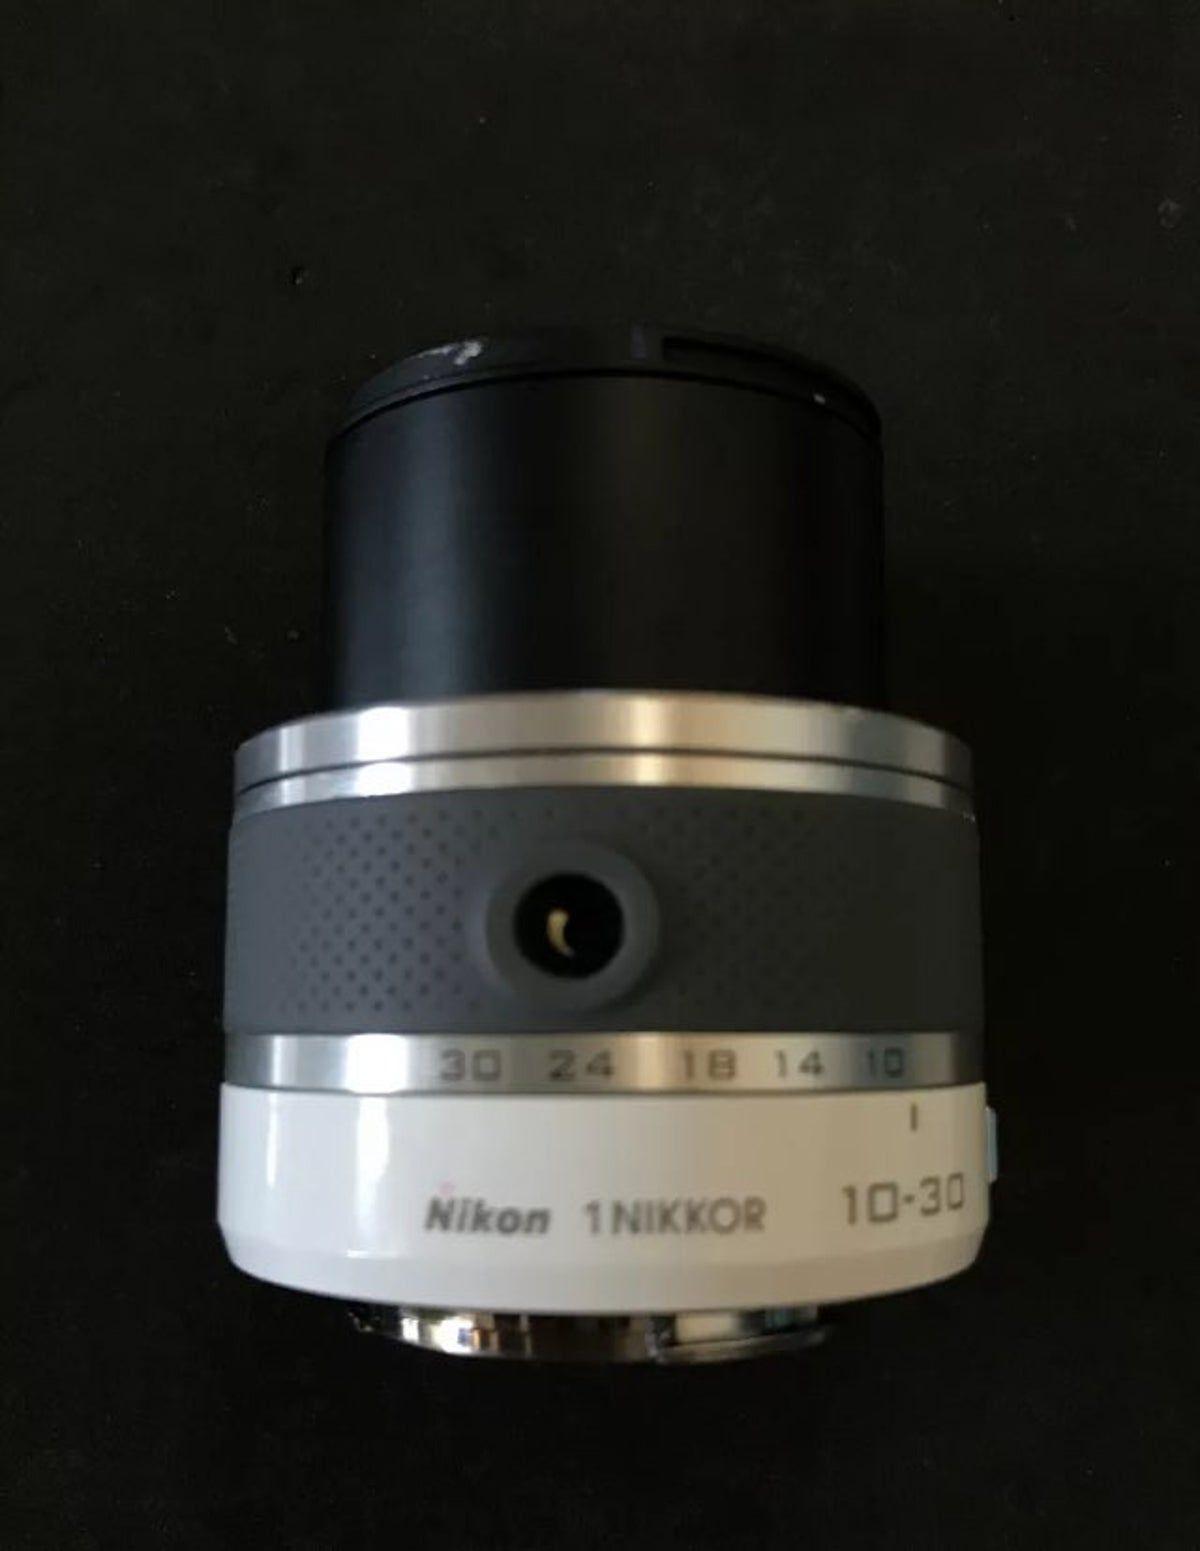 Nikon 1 NIKKOR 10-30mm f/3.5-5.6 AS VR S